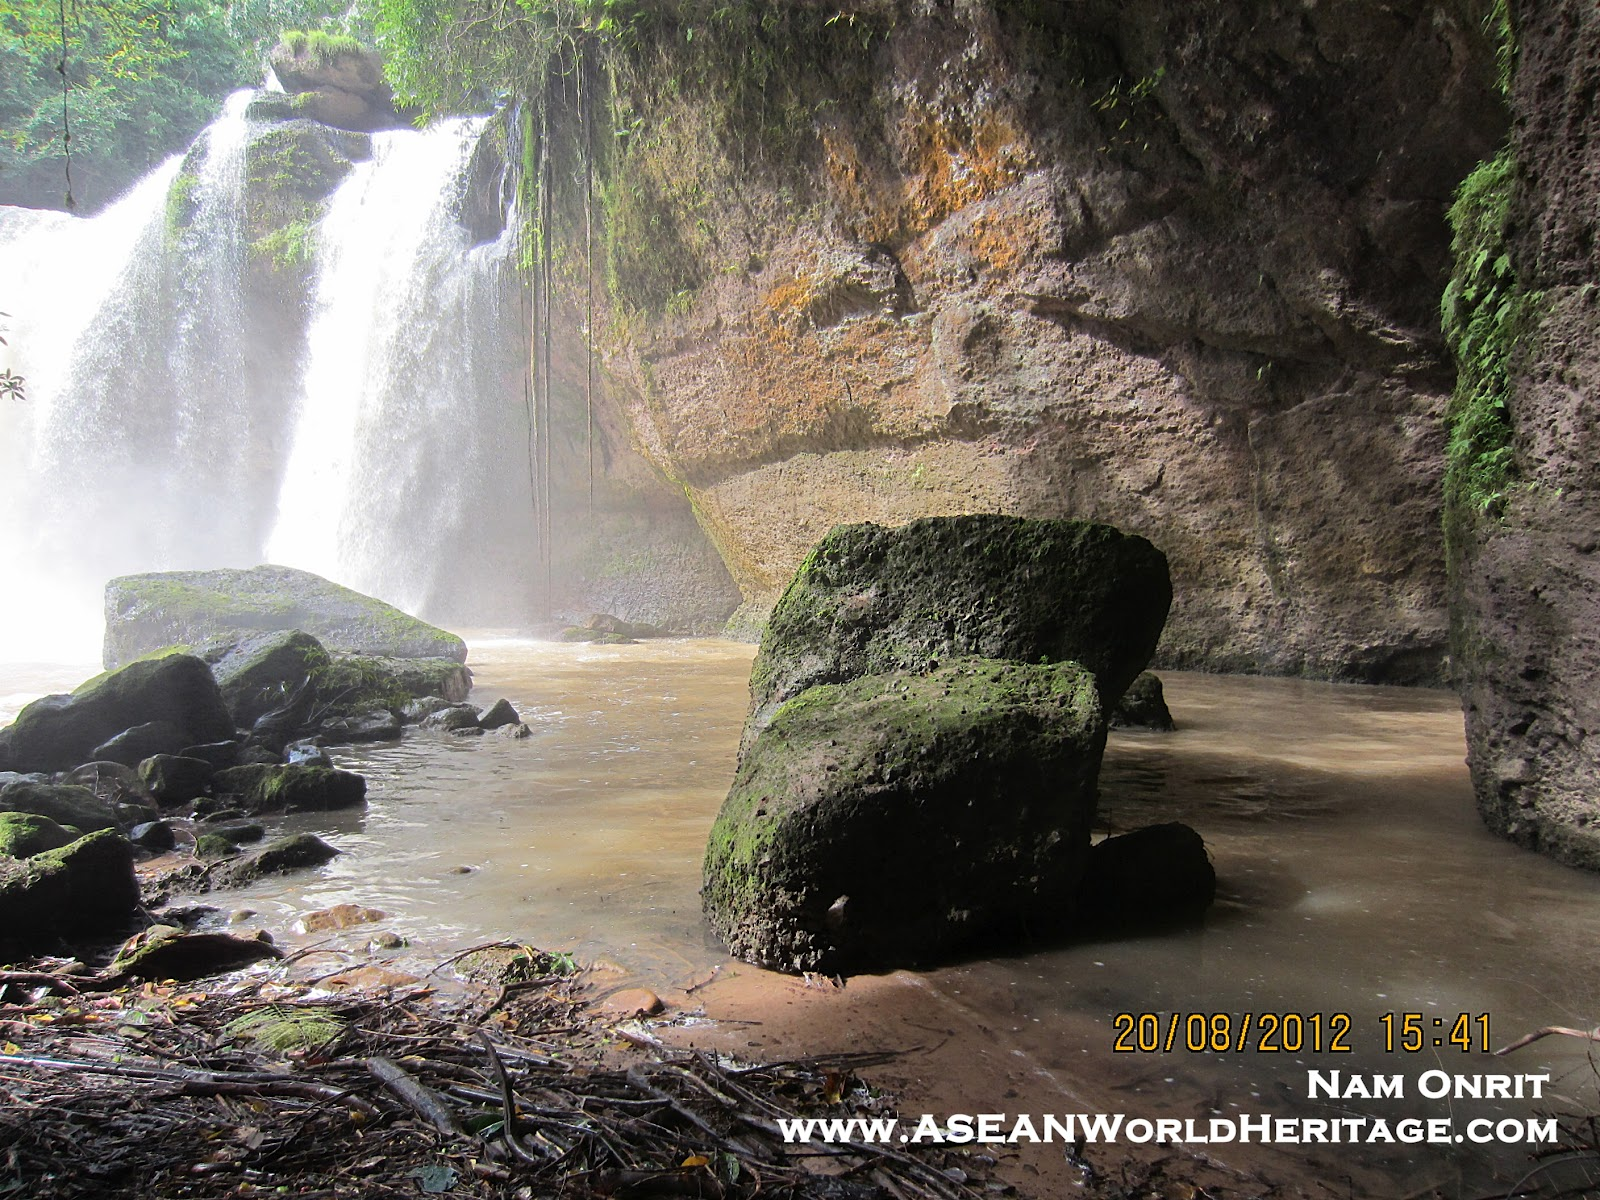 Khao Yai National Park - ASEAN World Heritage